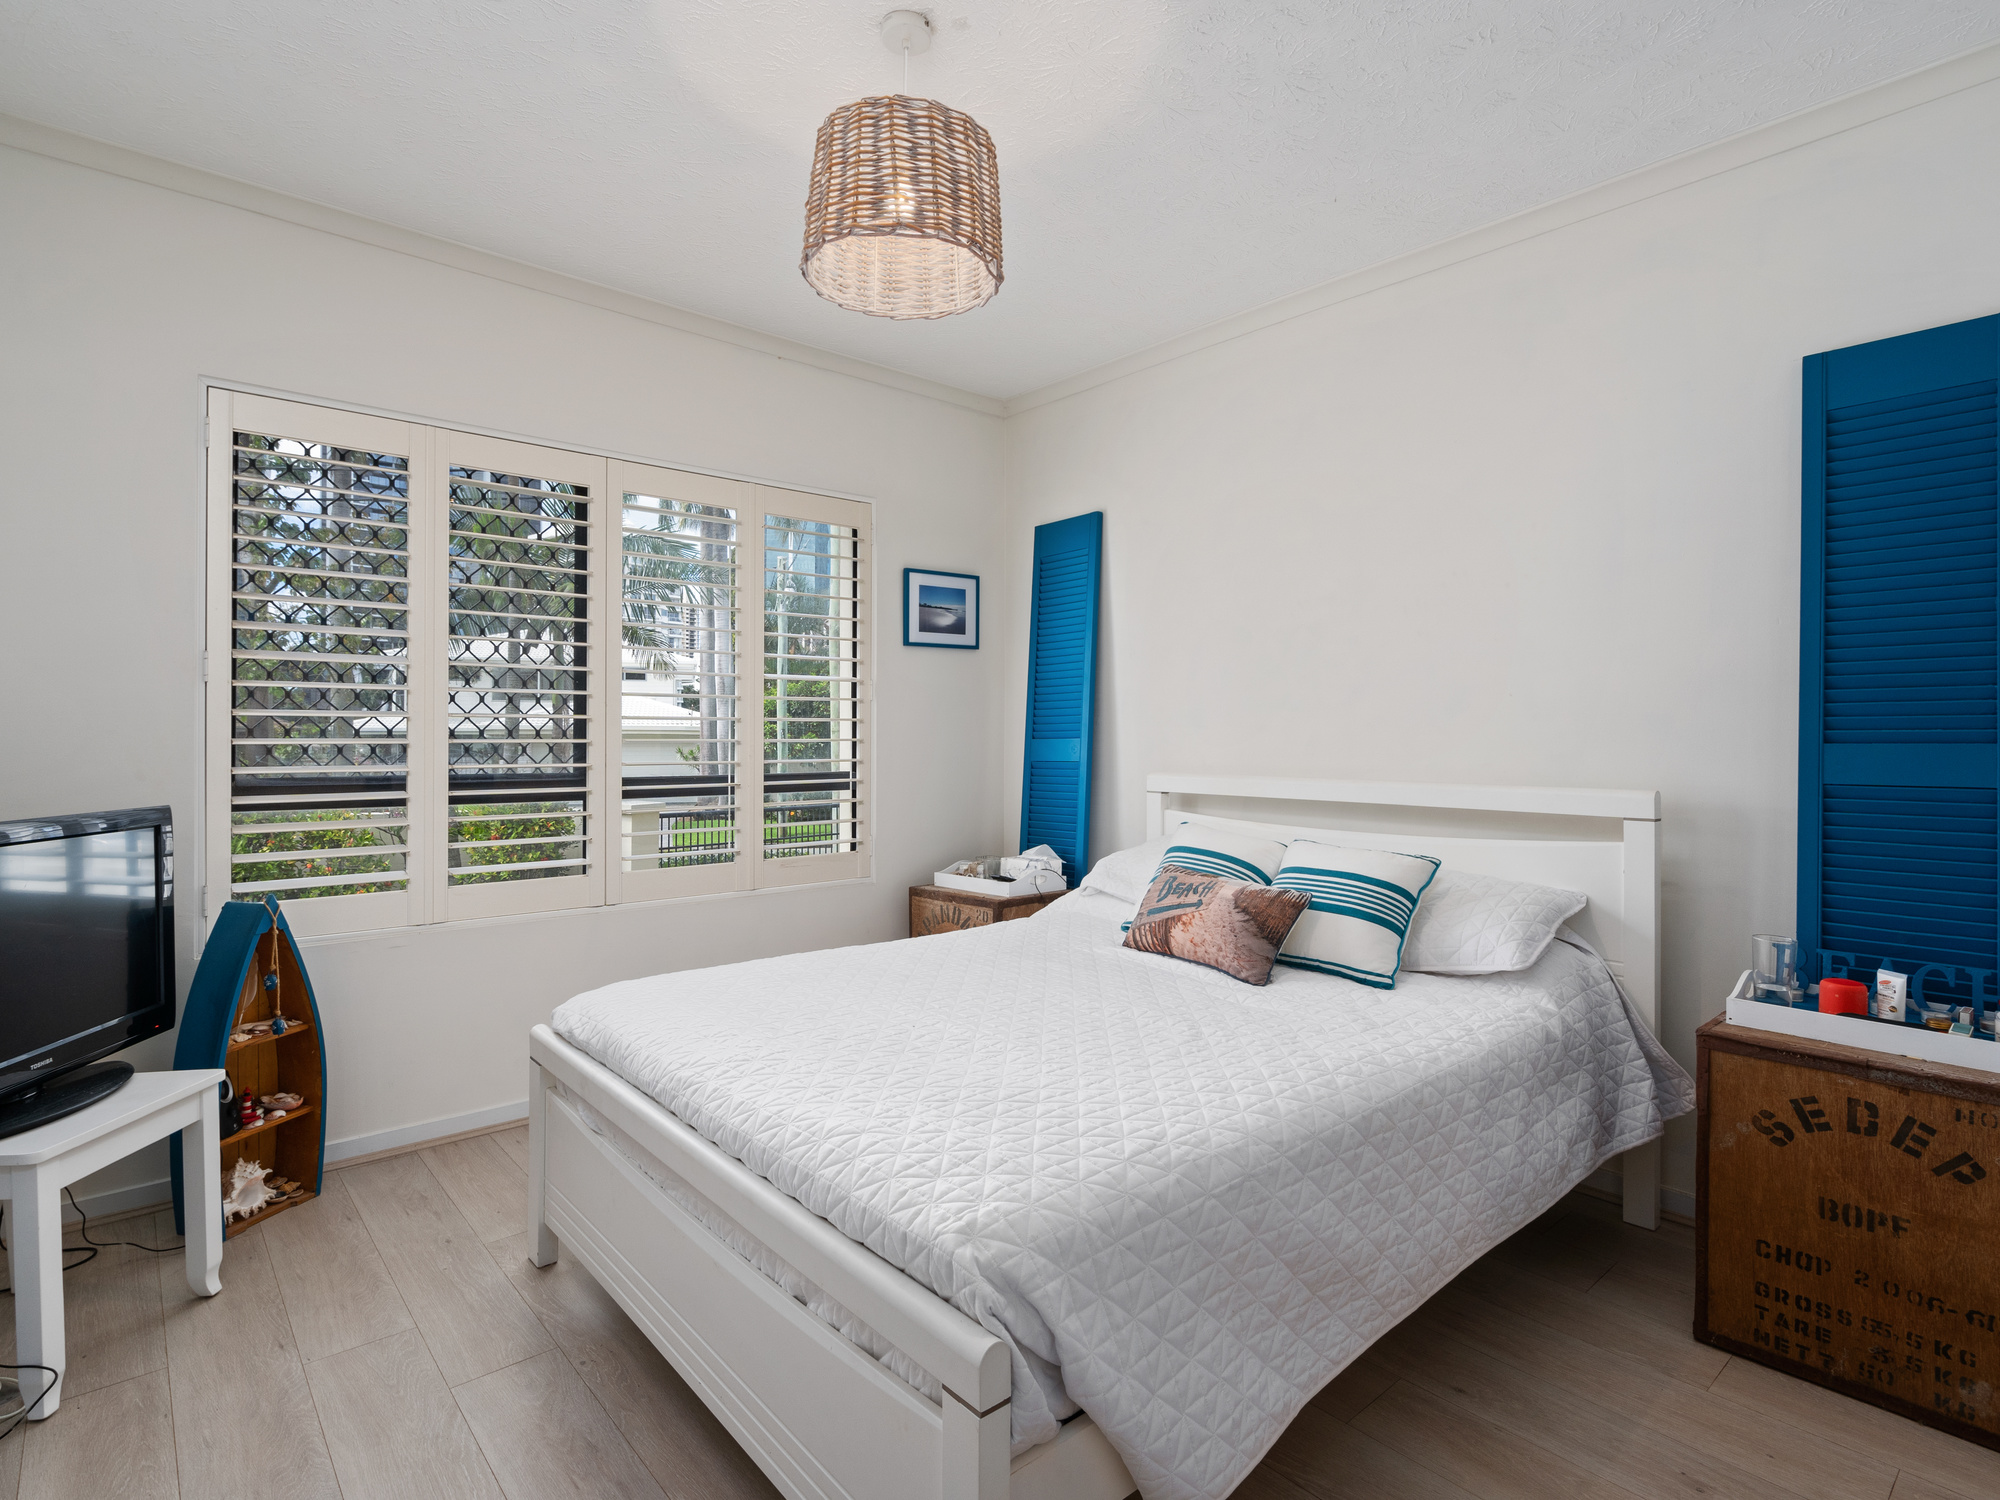 Real Estate | Gold Coast | Chevron Realty | 007 Open2view Id683962 3 10 16 Tarcoola Cresebt